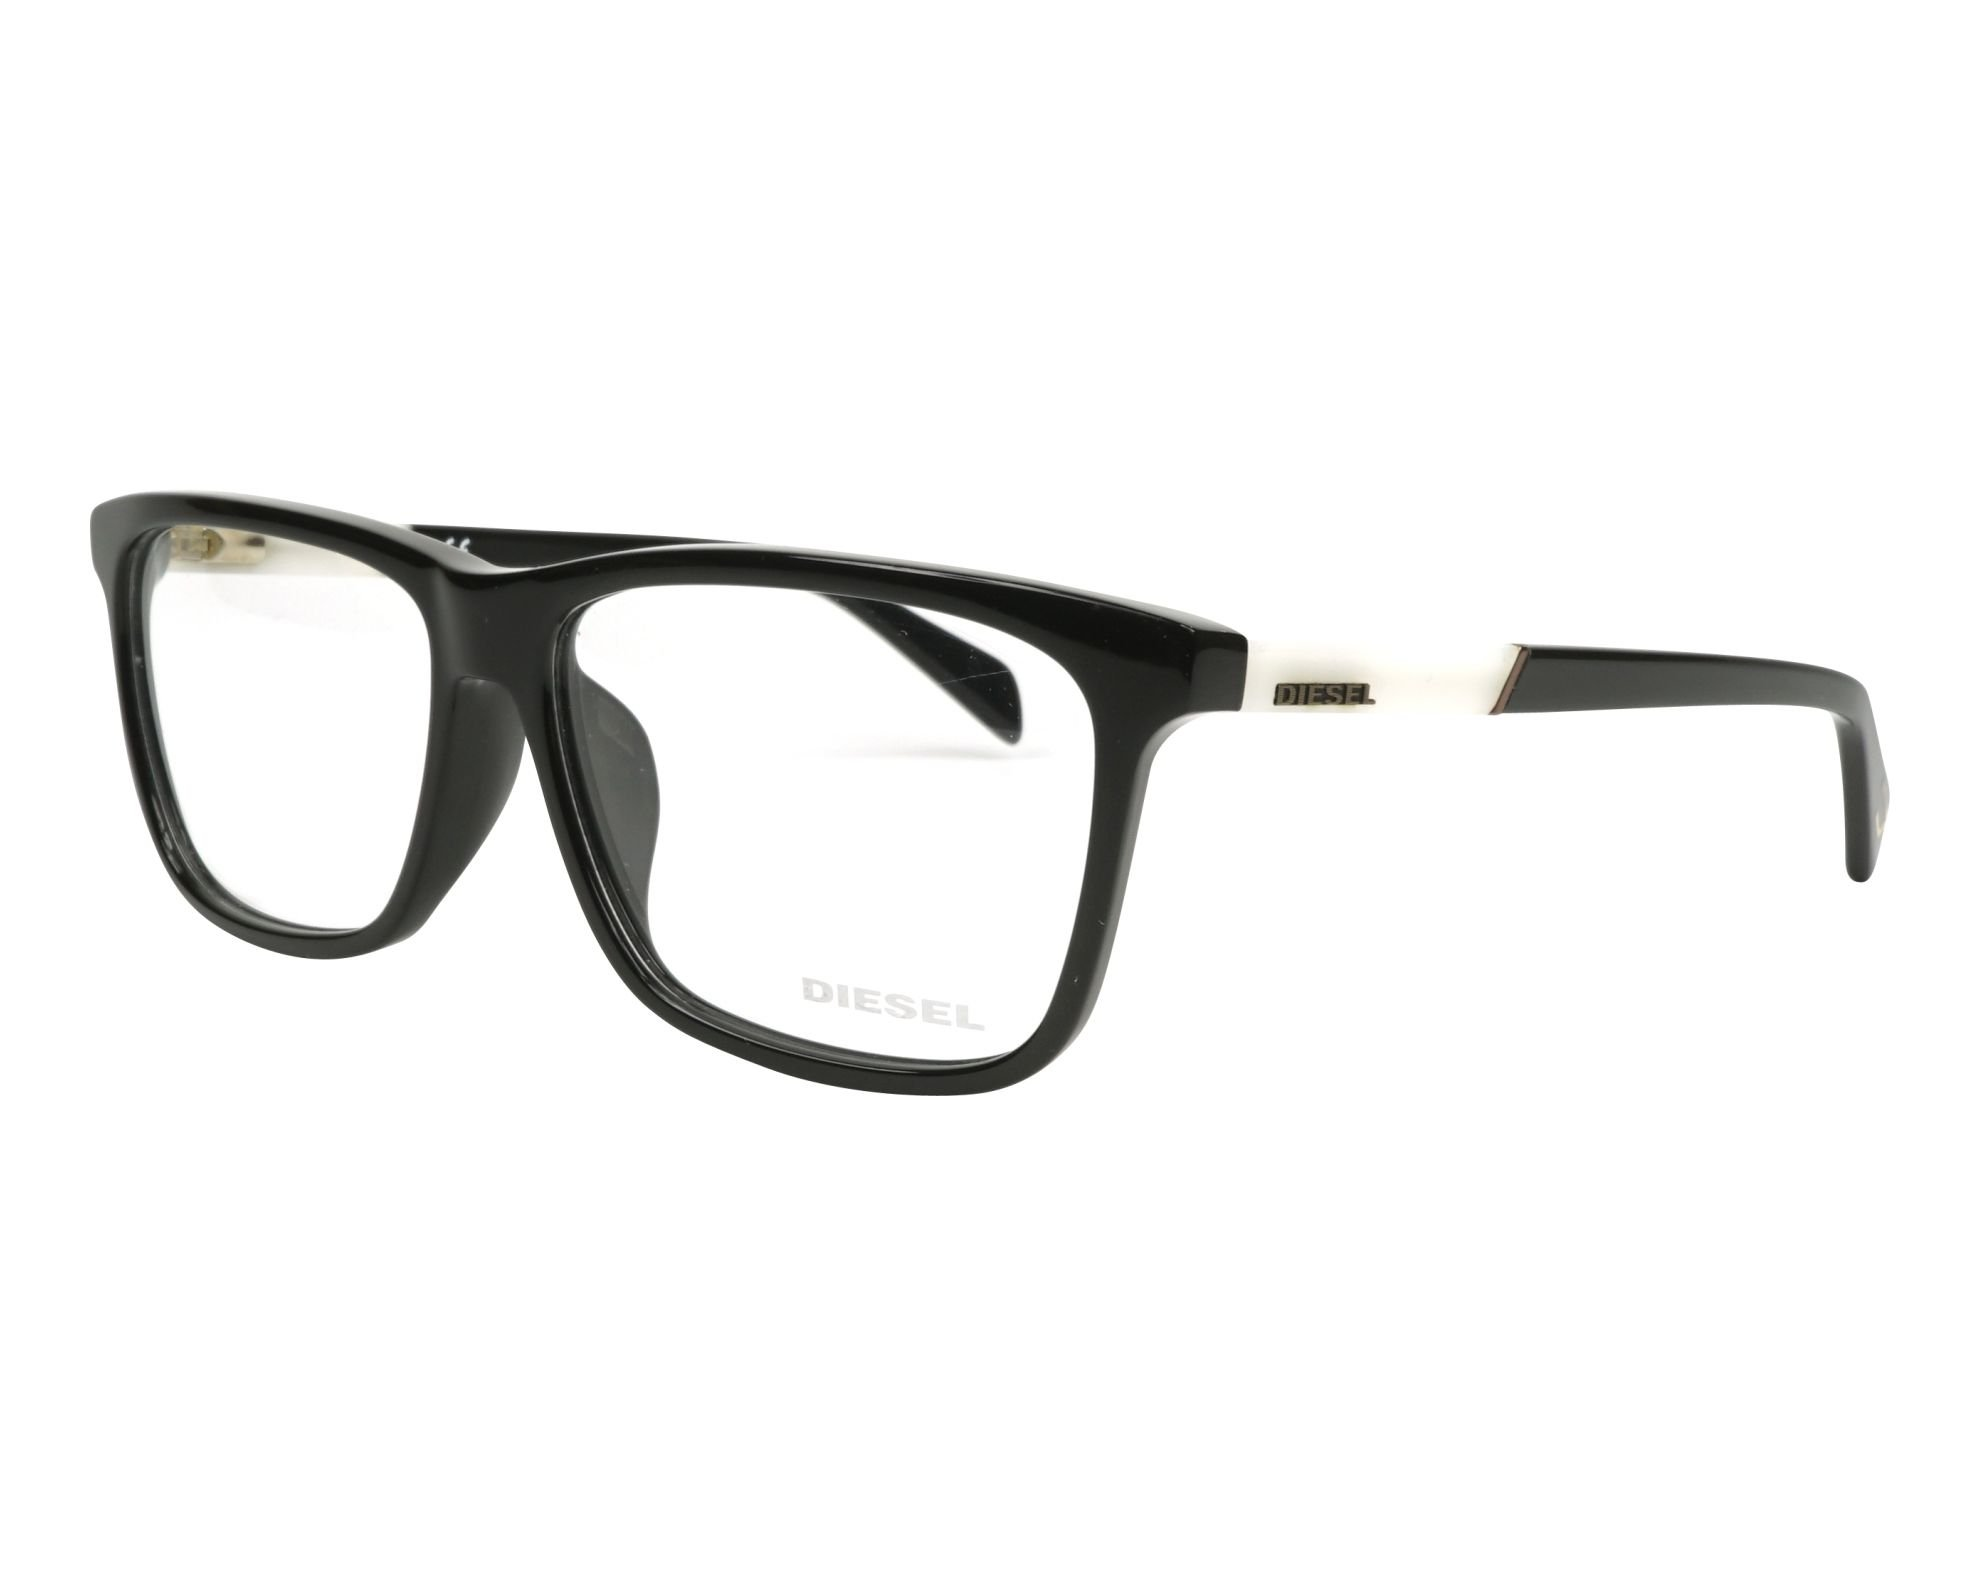 Diesel Rx Eyeglasses Frames DL5131-F 001 59-14-150 Shiny Black / White Asian Fit